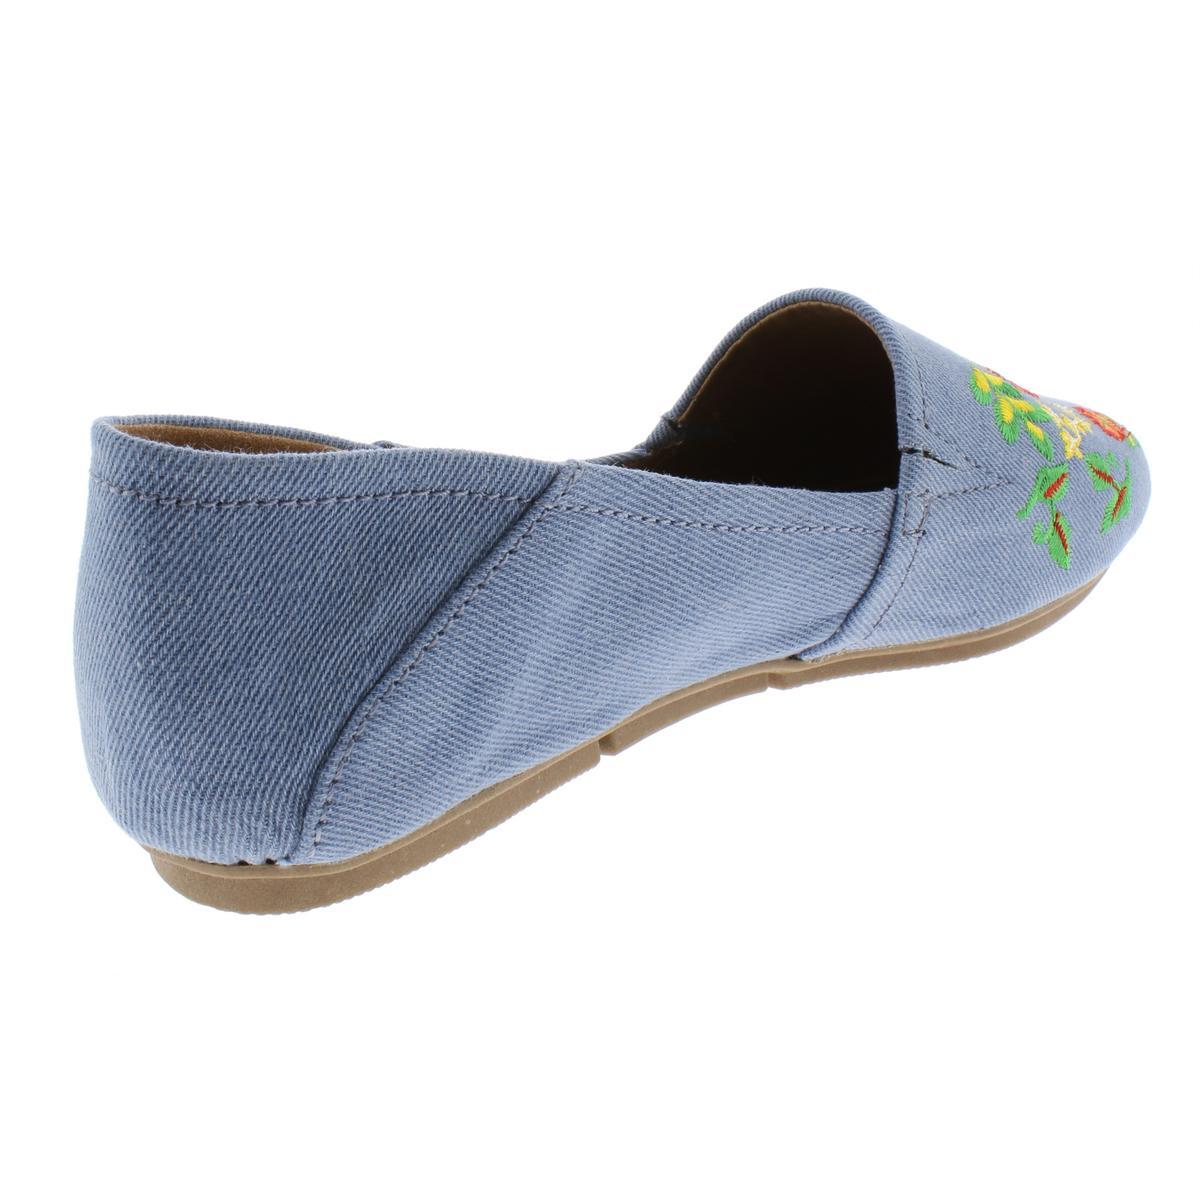 Style-amp-Co-Womens-Nixine-Slip-On-Flats-Casual-Shoes-Shoes-BHFO-6071 thumbnail 4